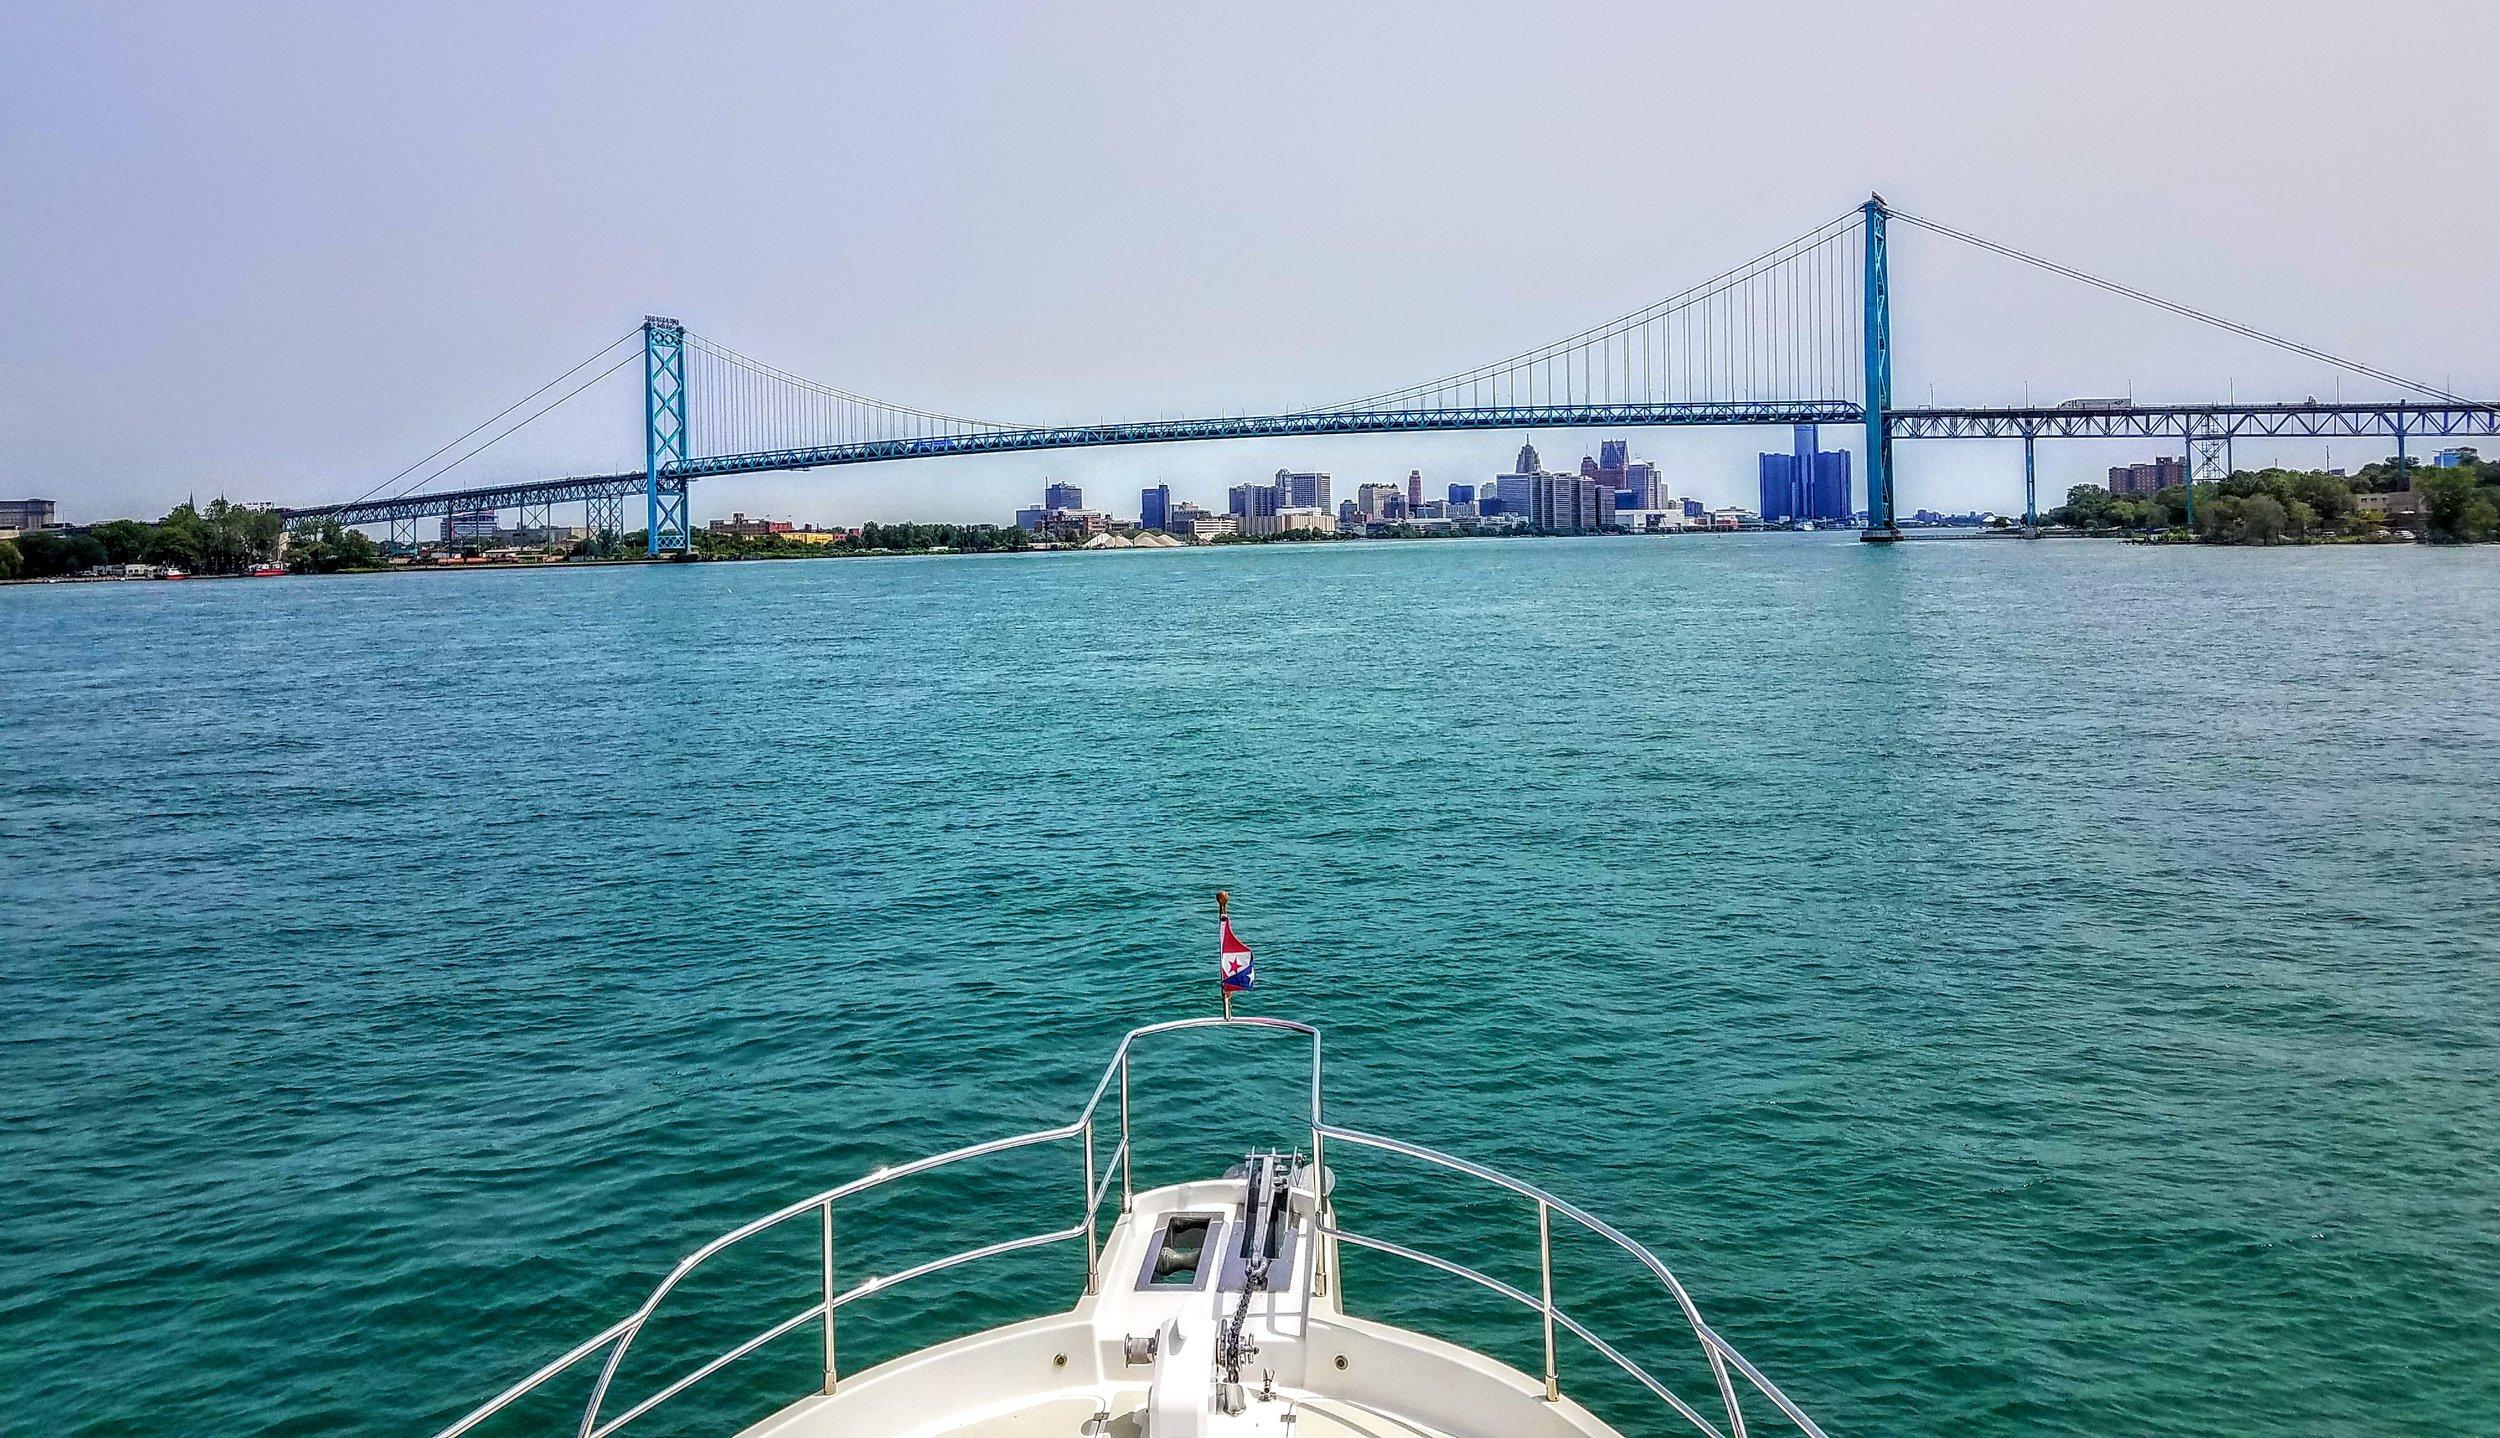 International Bridge greats us as we enter the Detroit Harbor